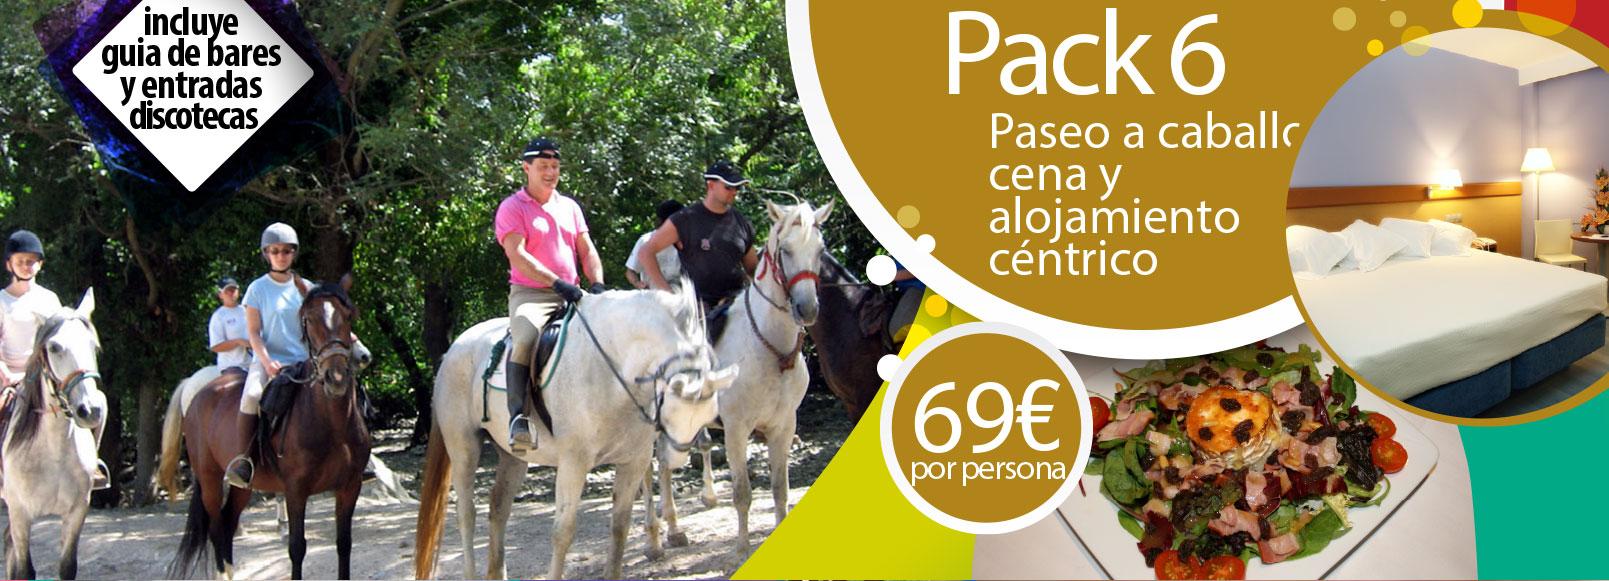 Pack 6: Paseo a caballo, cena y alojamiento céntrico